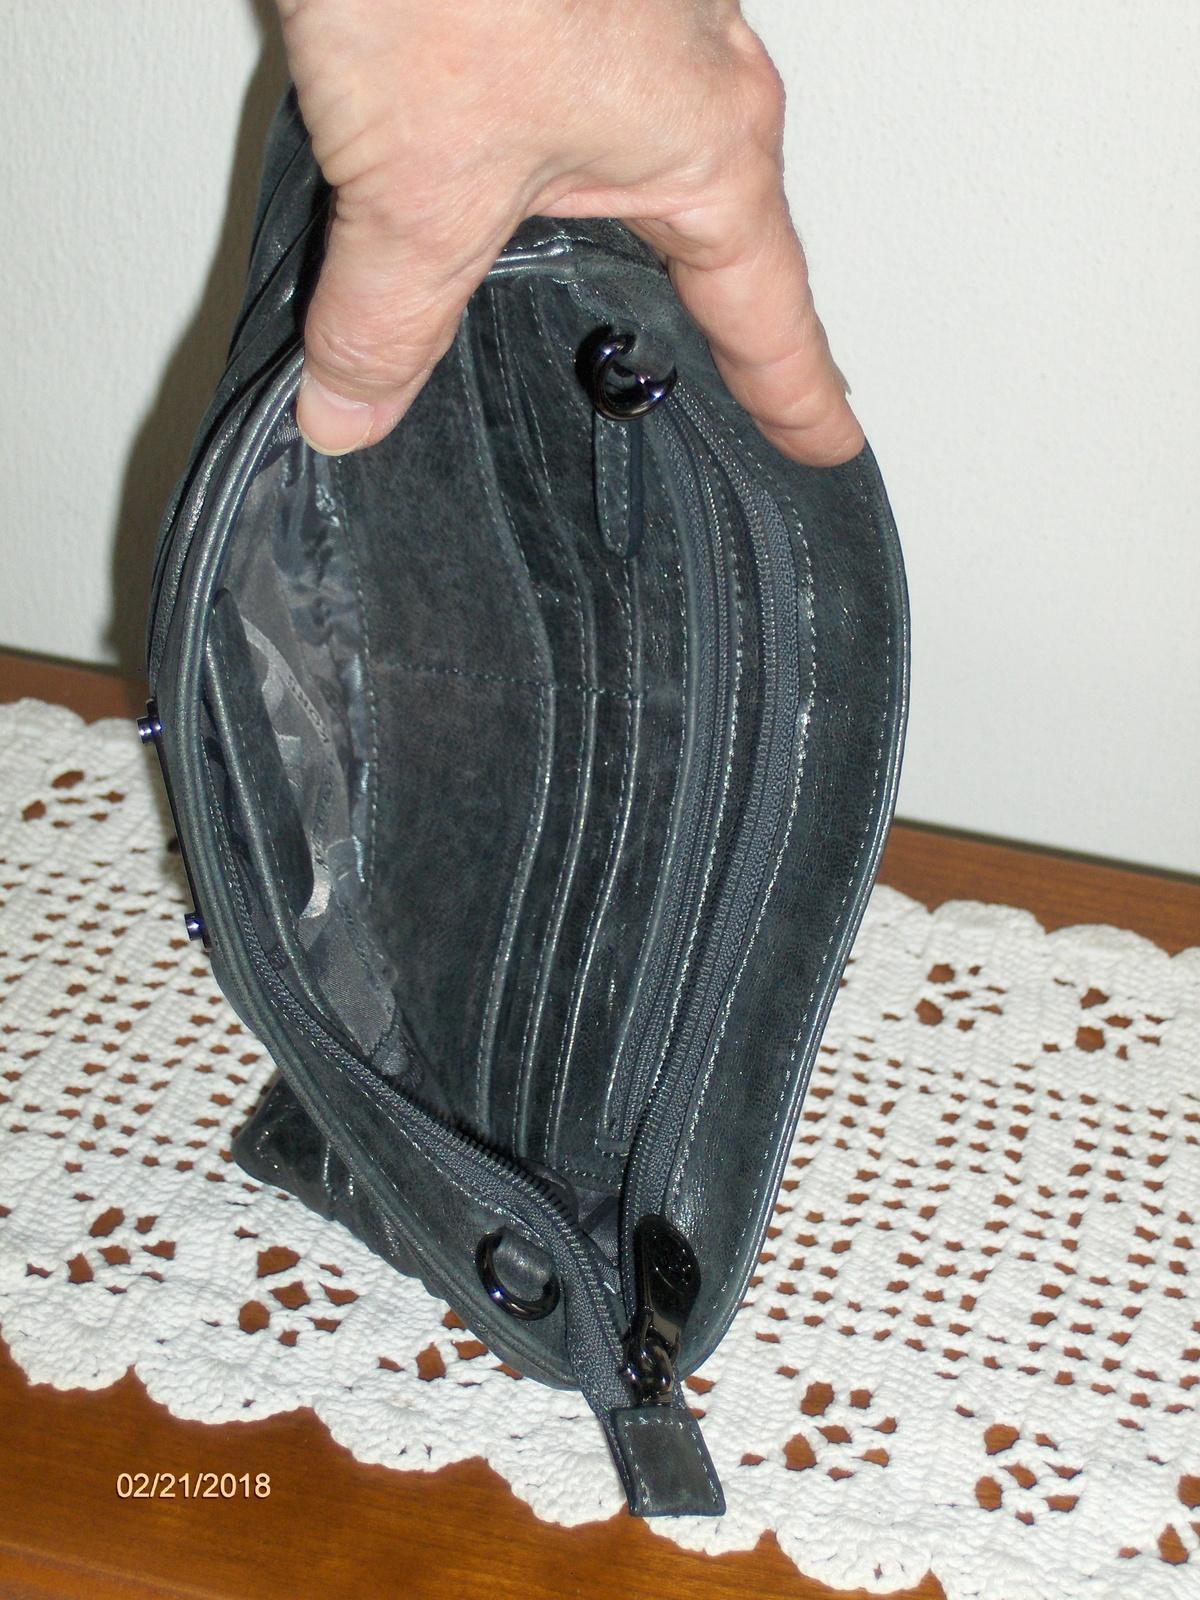 Michael Kors Gray Leather Webster Wristlet Clutch Bag Purse Wallet NO STRAP